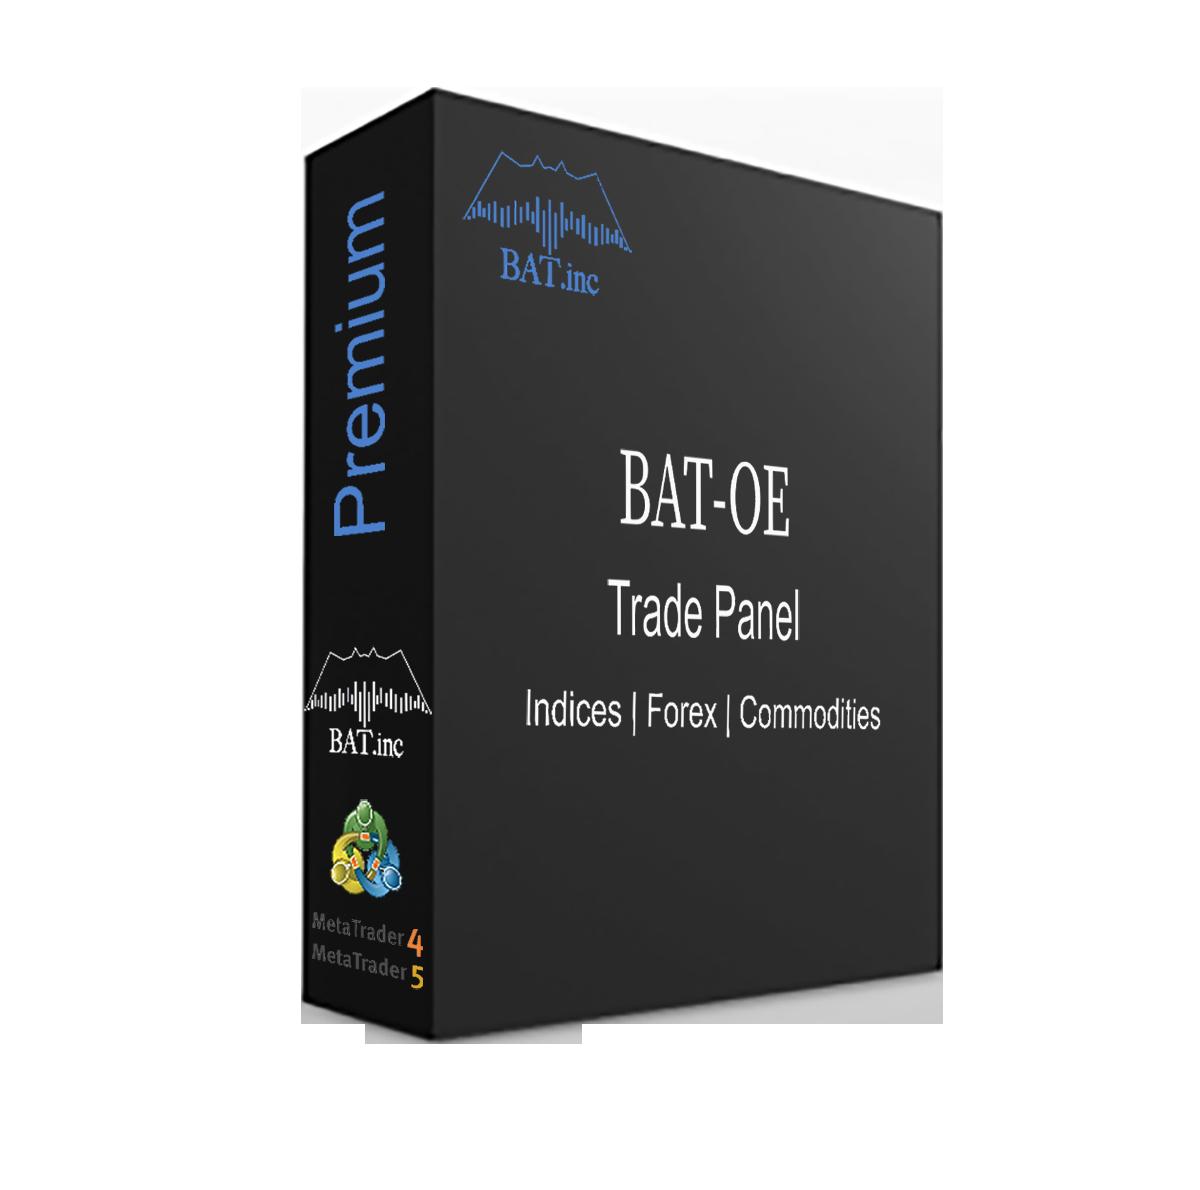 BAT-OE Product Image